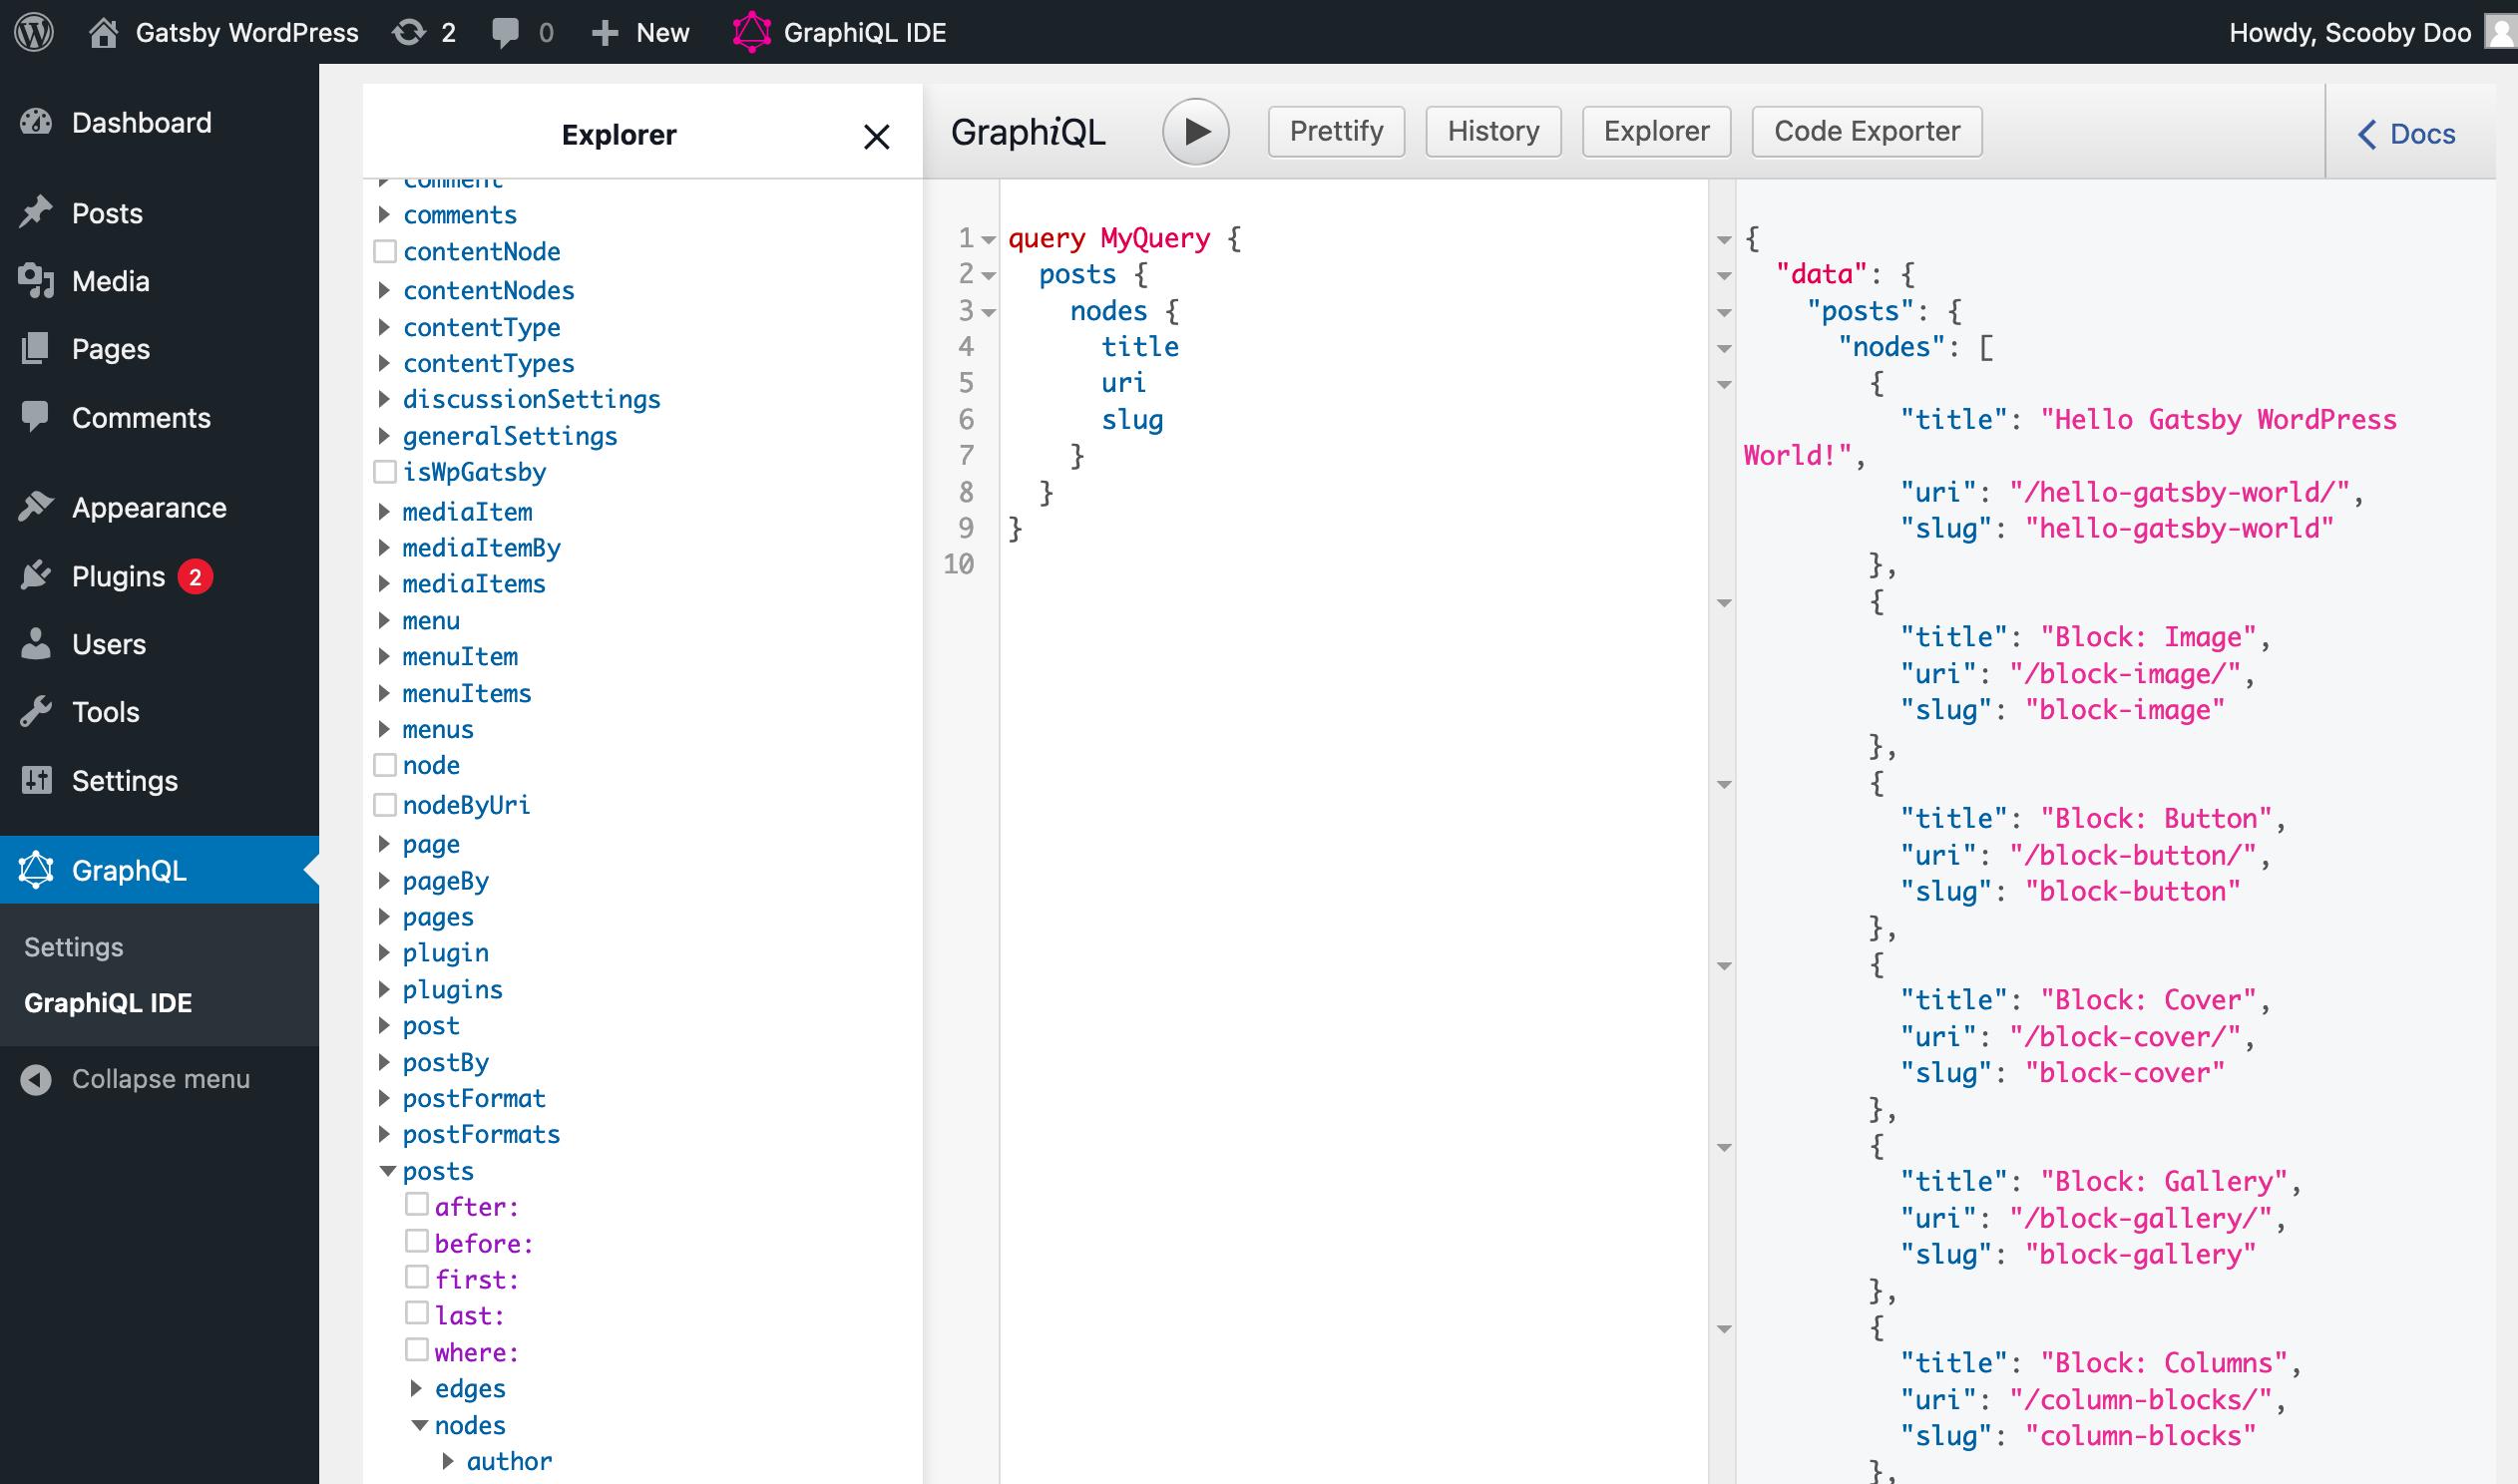 Screenshot of the GraphiQL UI in the WordPress admin, showing a three-panel UI.